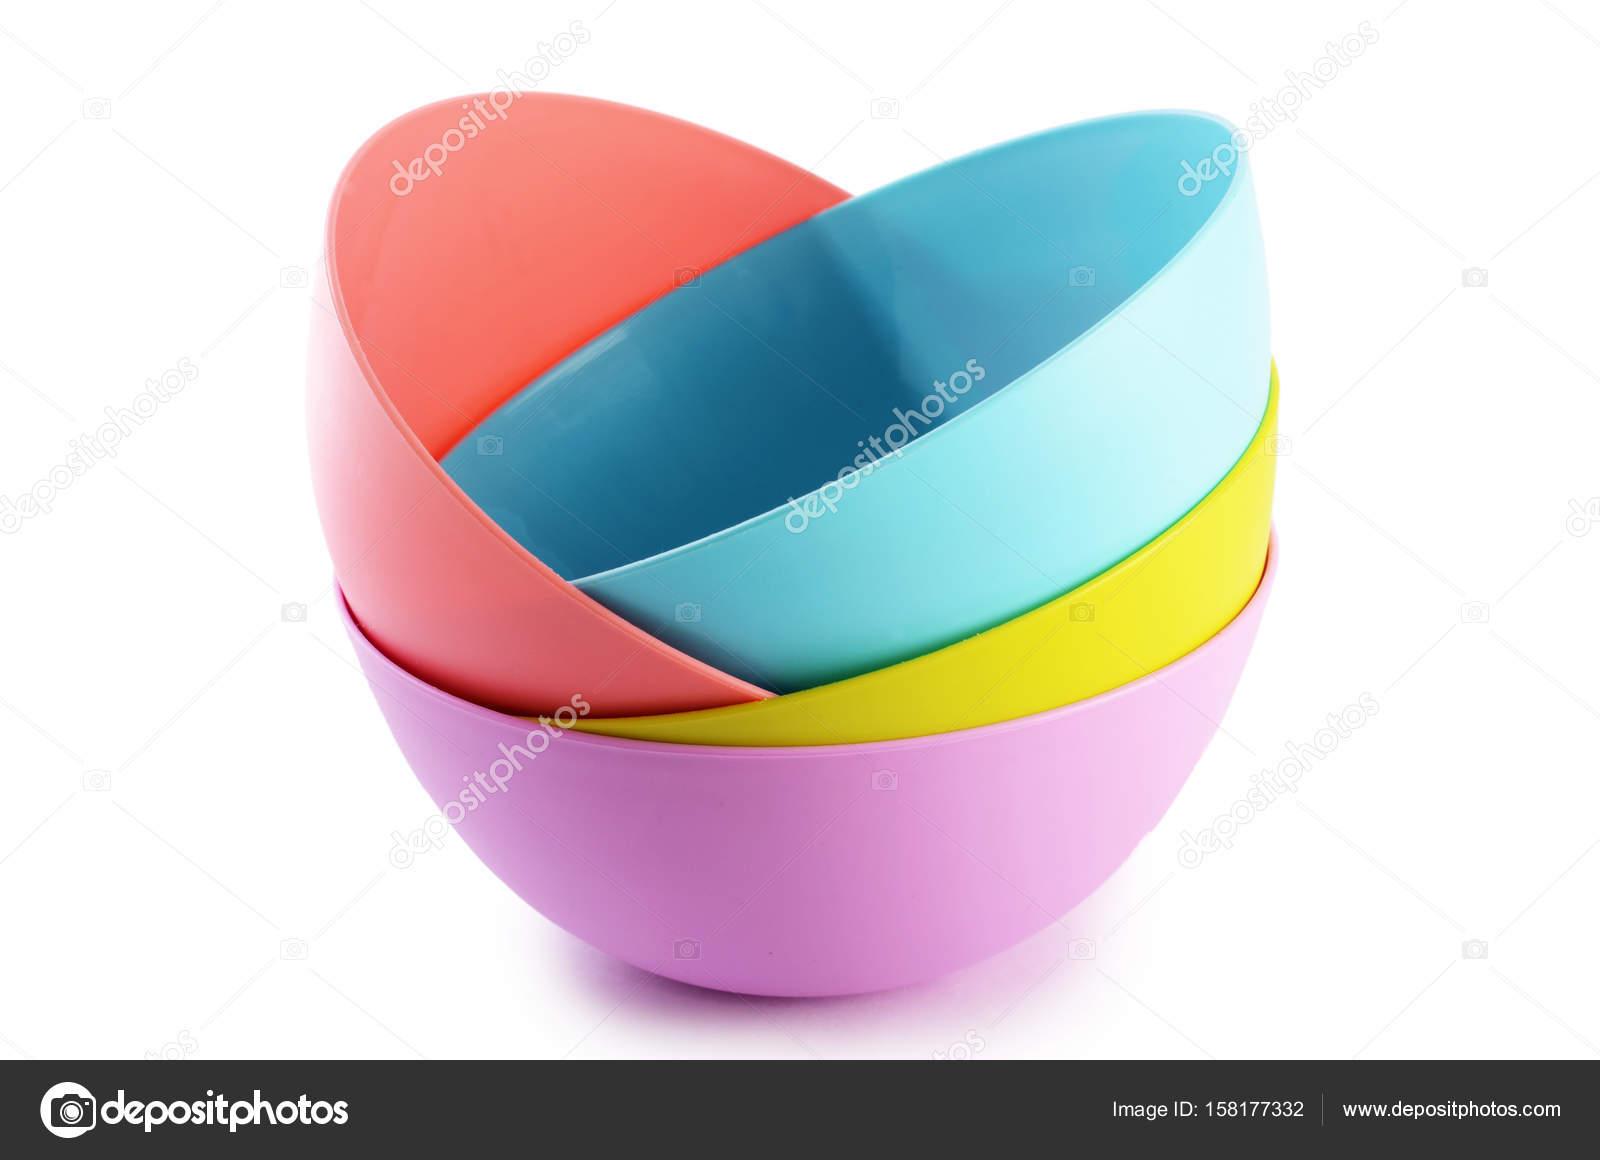 Plastic colorful plates isolated on white u2014 Stock Photo  sc 1 st  Depositphotos & Plastic colorful plates isolated on white u2014 Stock Photo © sveta ...